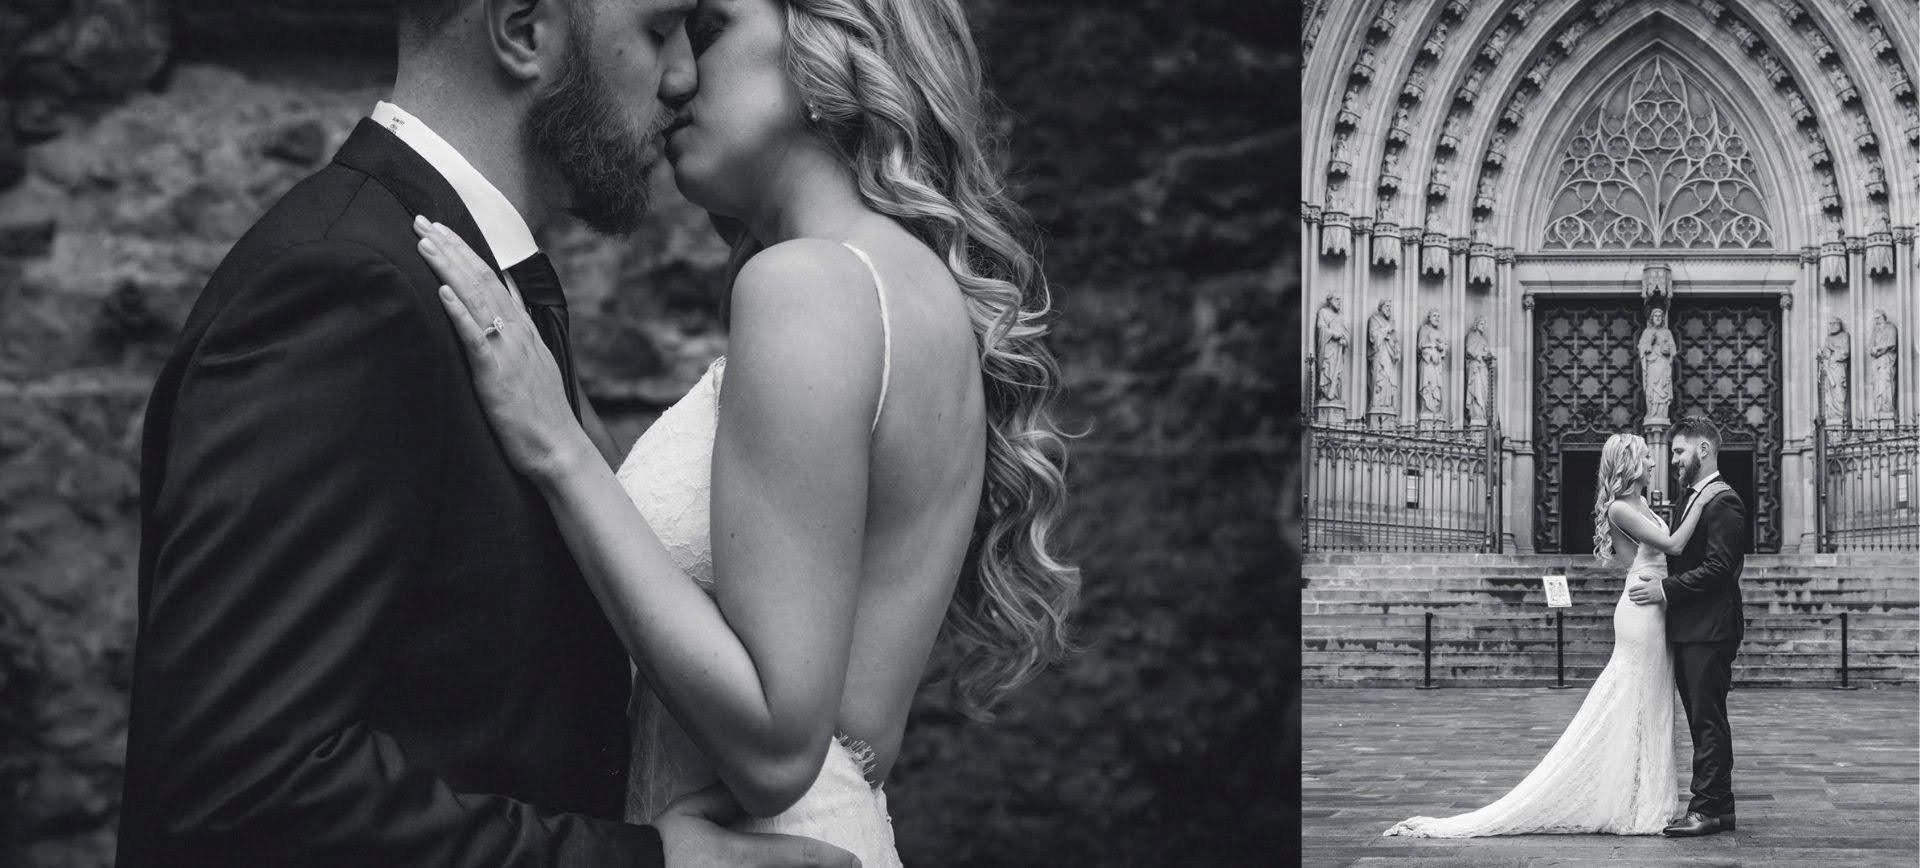 Barcelona wedding package - Gothic Quarter